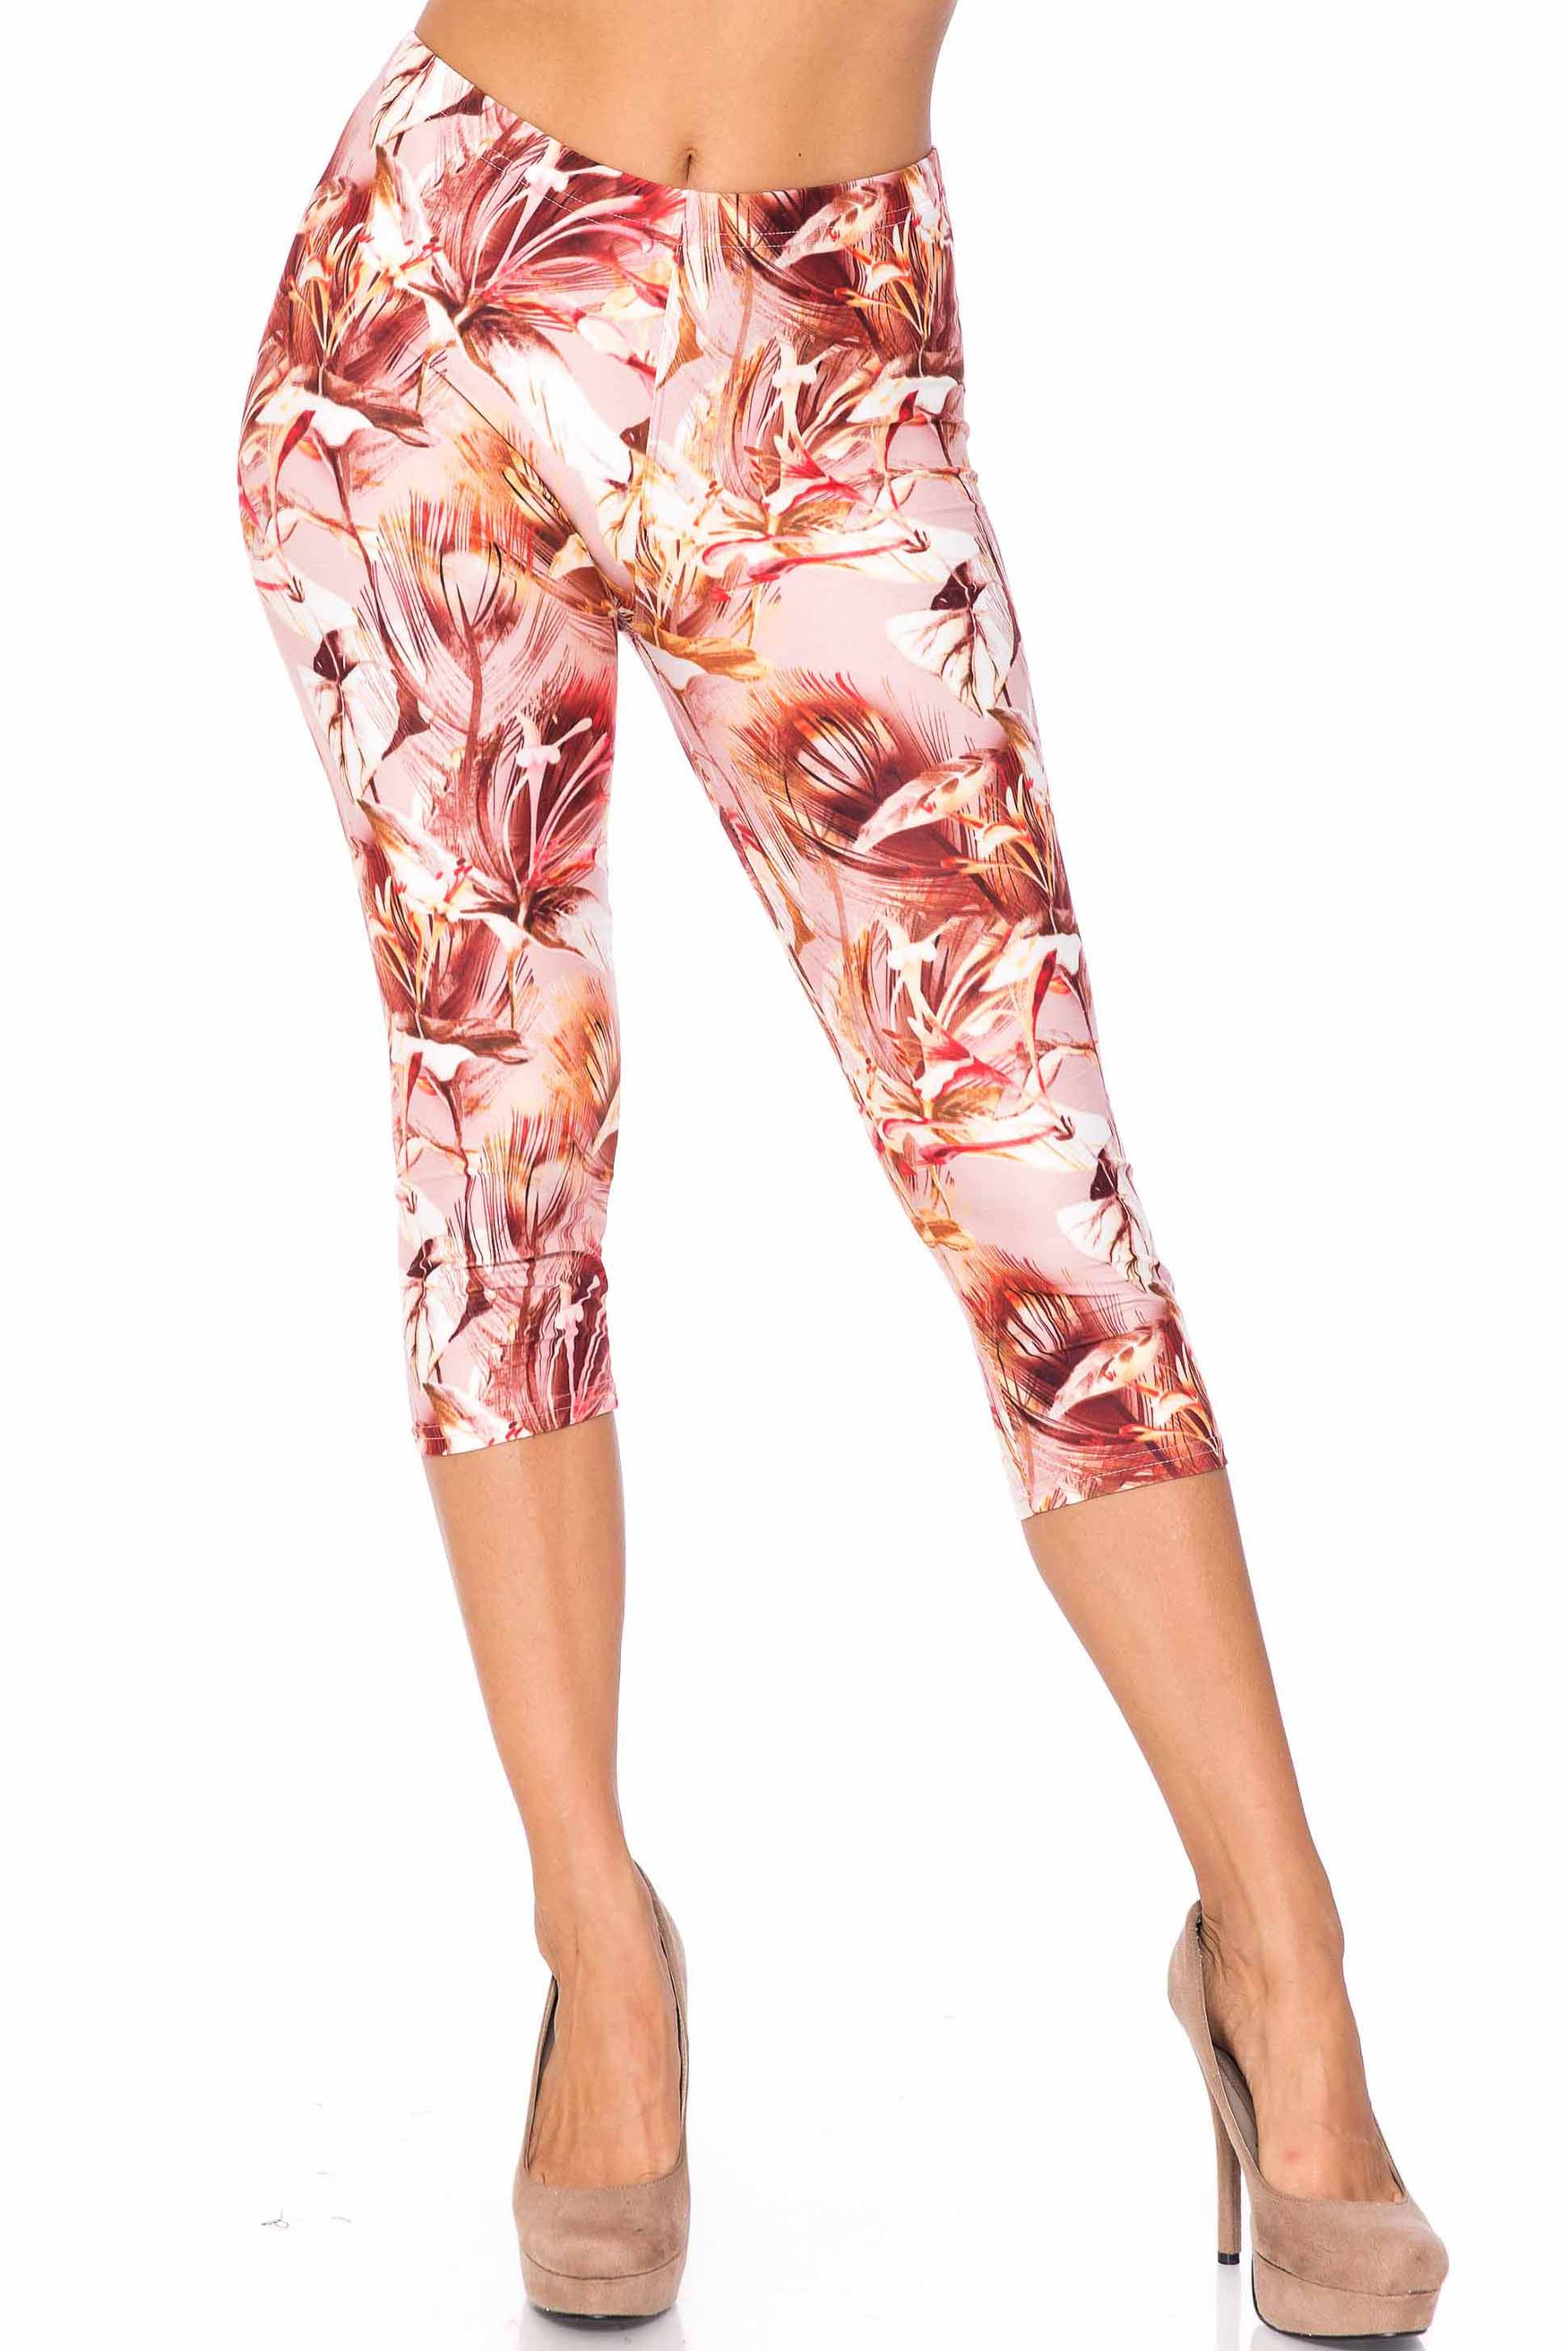 Creamy Soft Mocha Floral Extra Plus Size Capris - 3X-5X - USA Fashion™